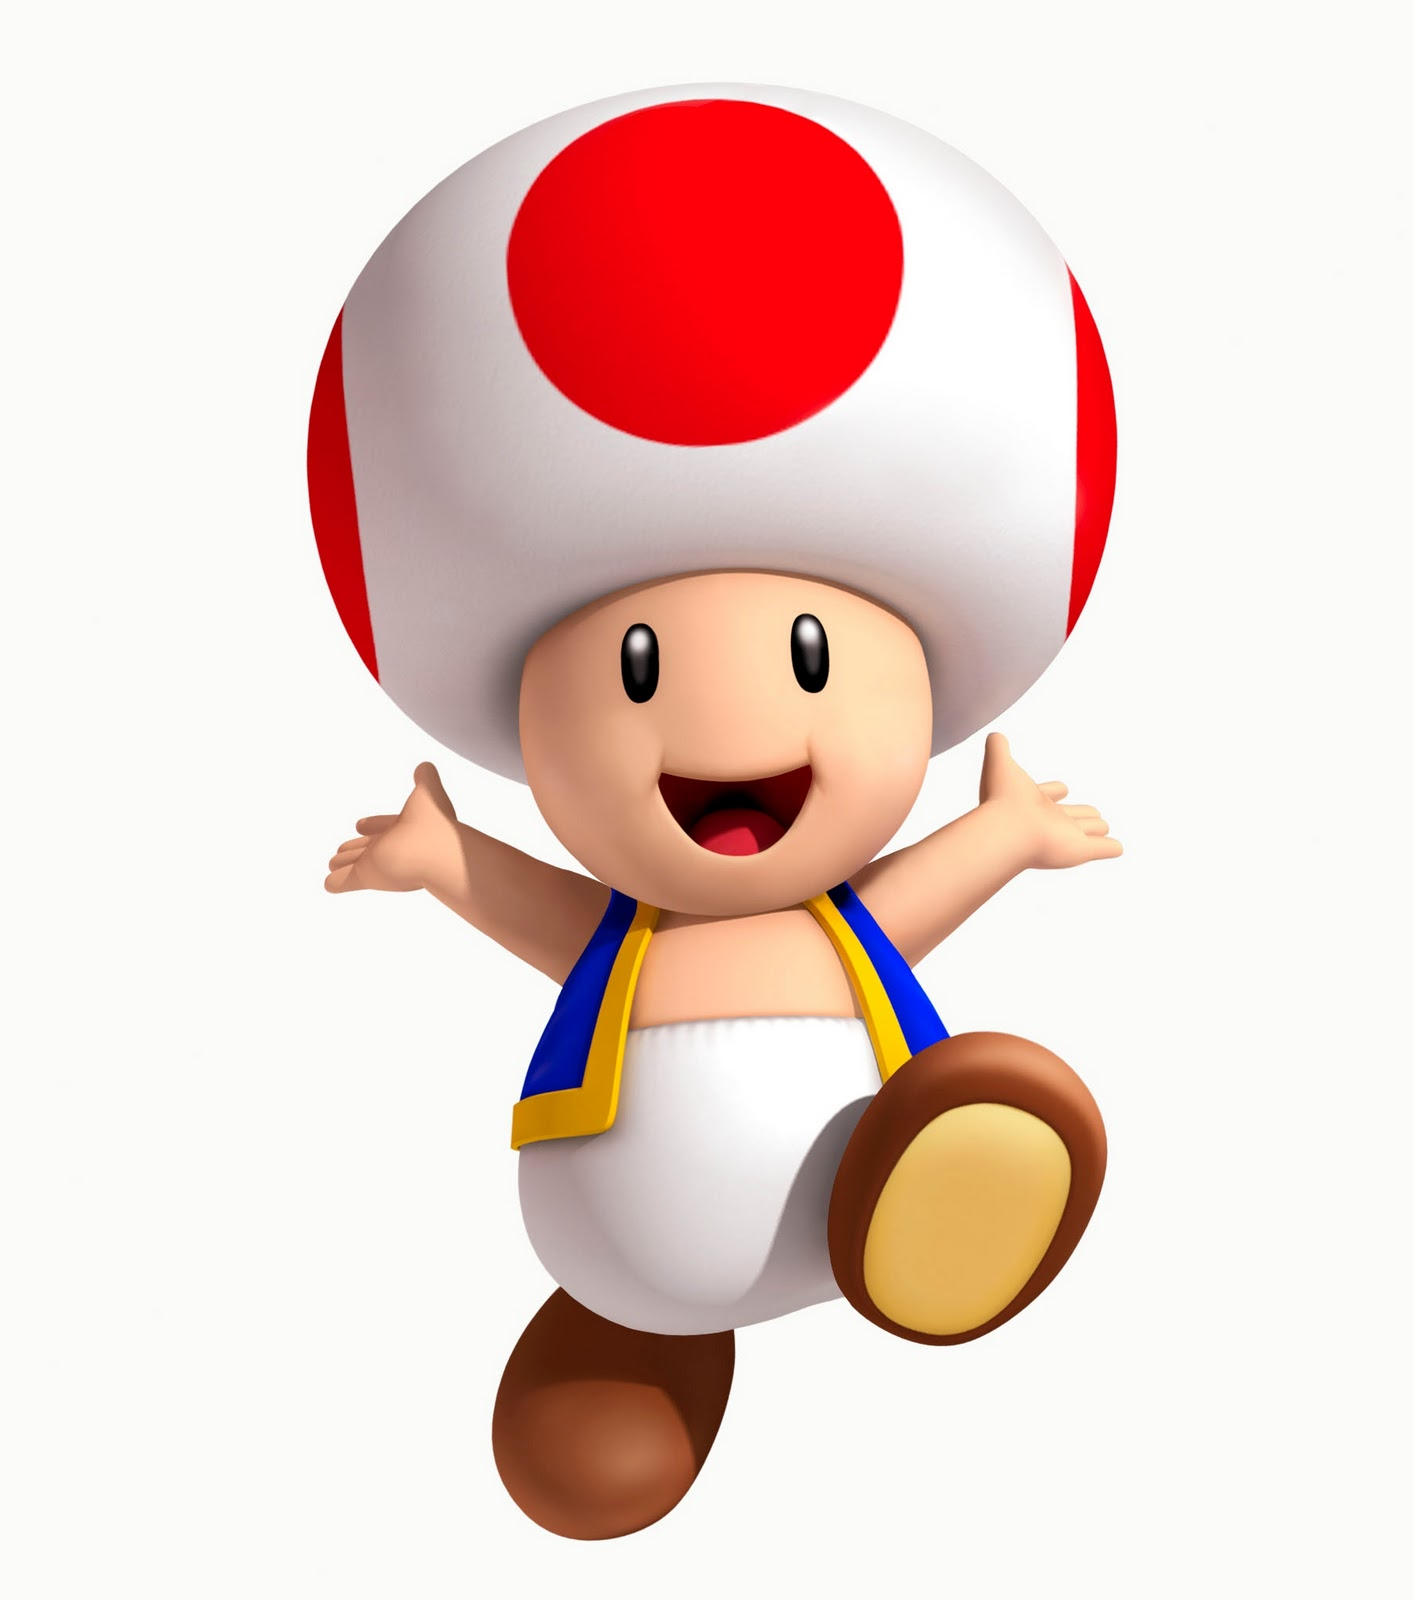 Toad super mario 3D land 3DS nintendo